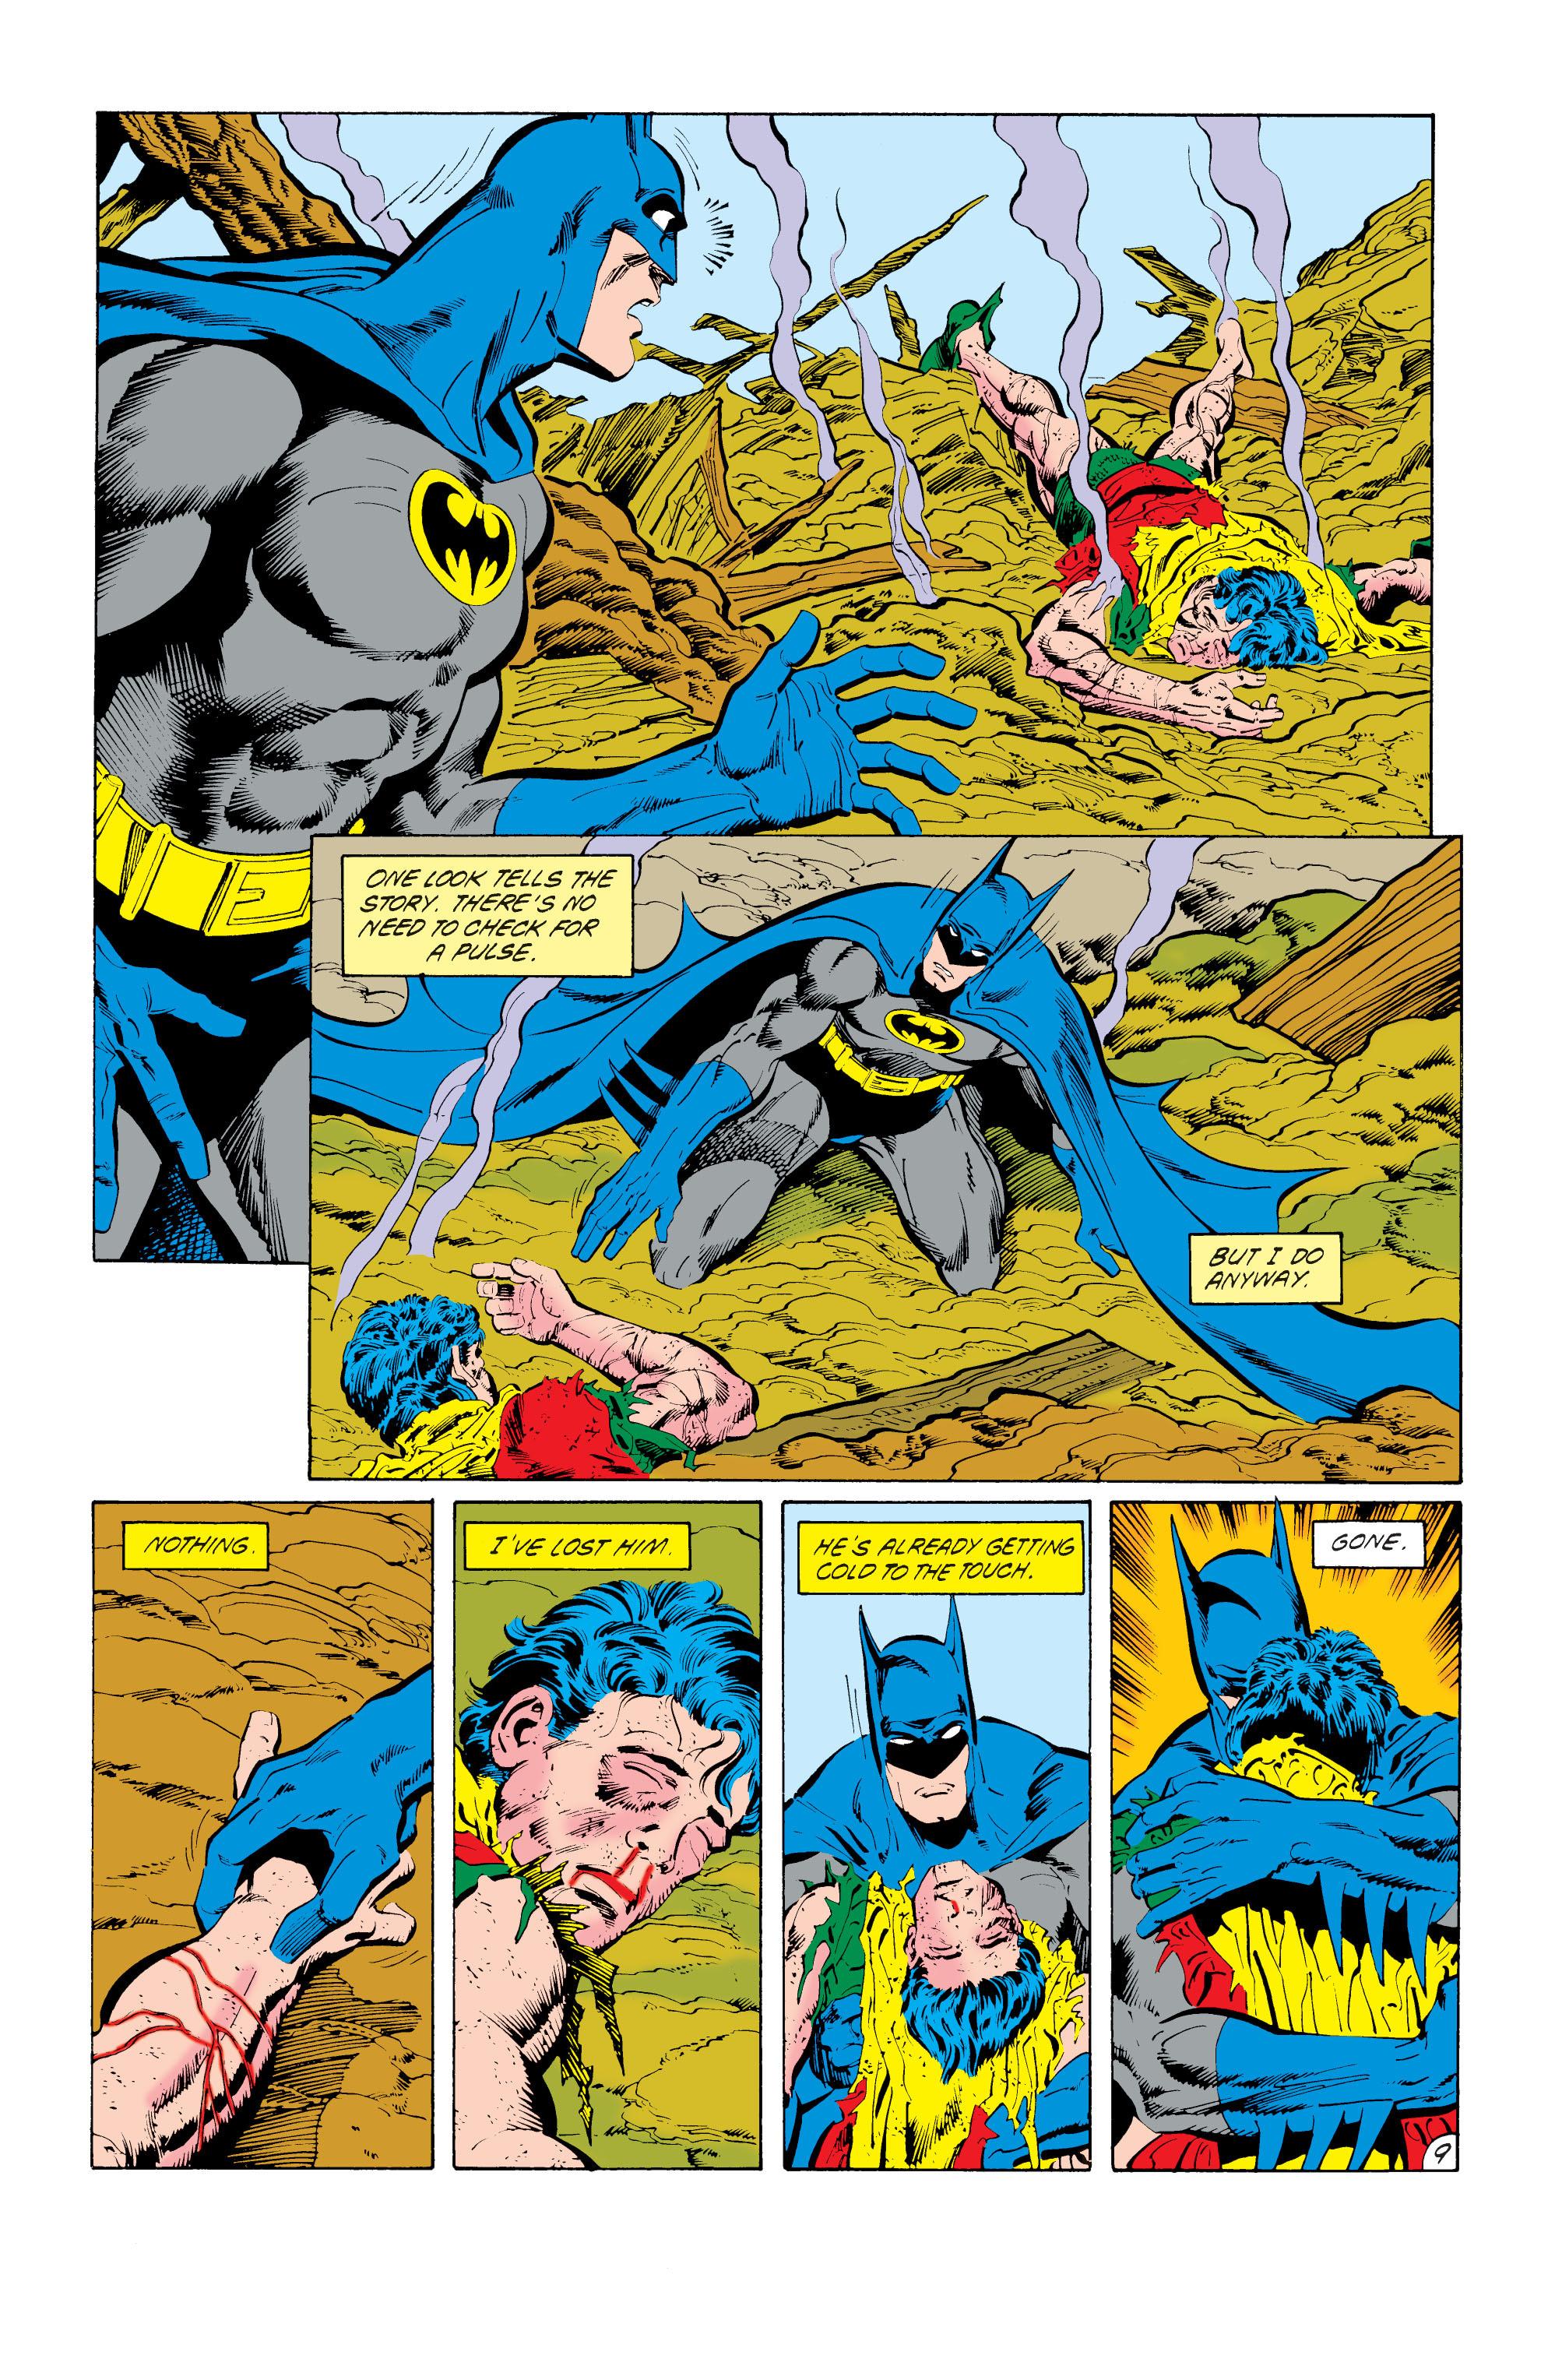 Psychology of Bruce Wayne PES_16VX4BoyWi9g2_CvmCukfaGmWwNdXfvYBLbMqRlNpT5zdAO40r0p0tJ7k6UU88L7zYh9XG0d=s0